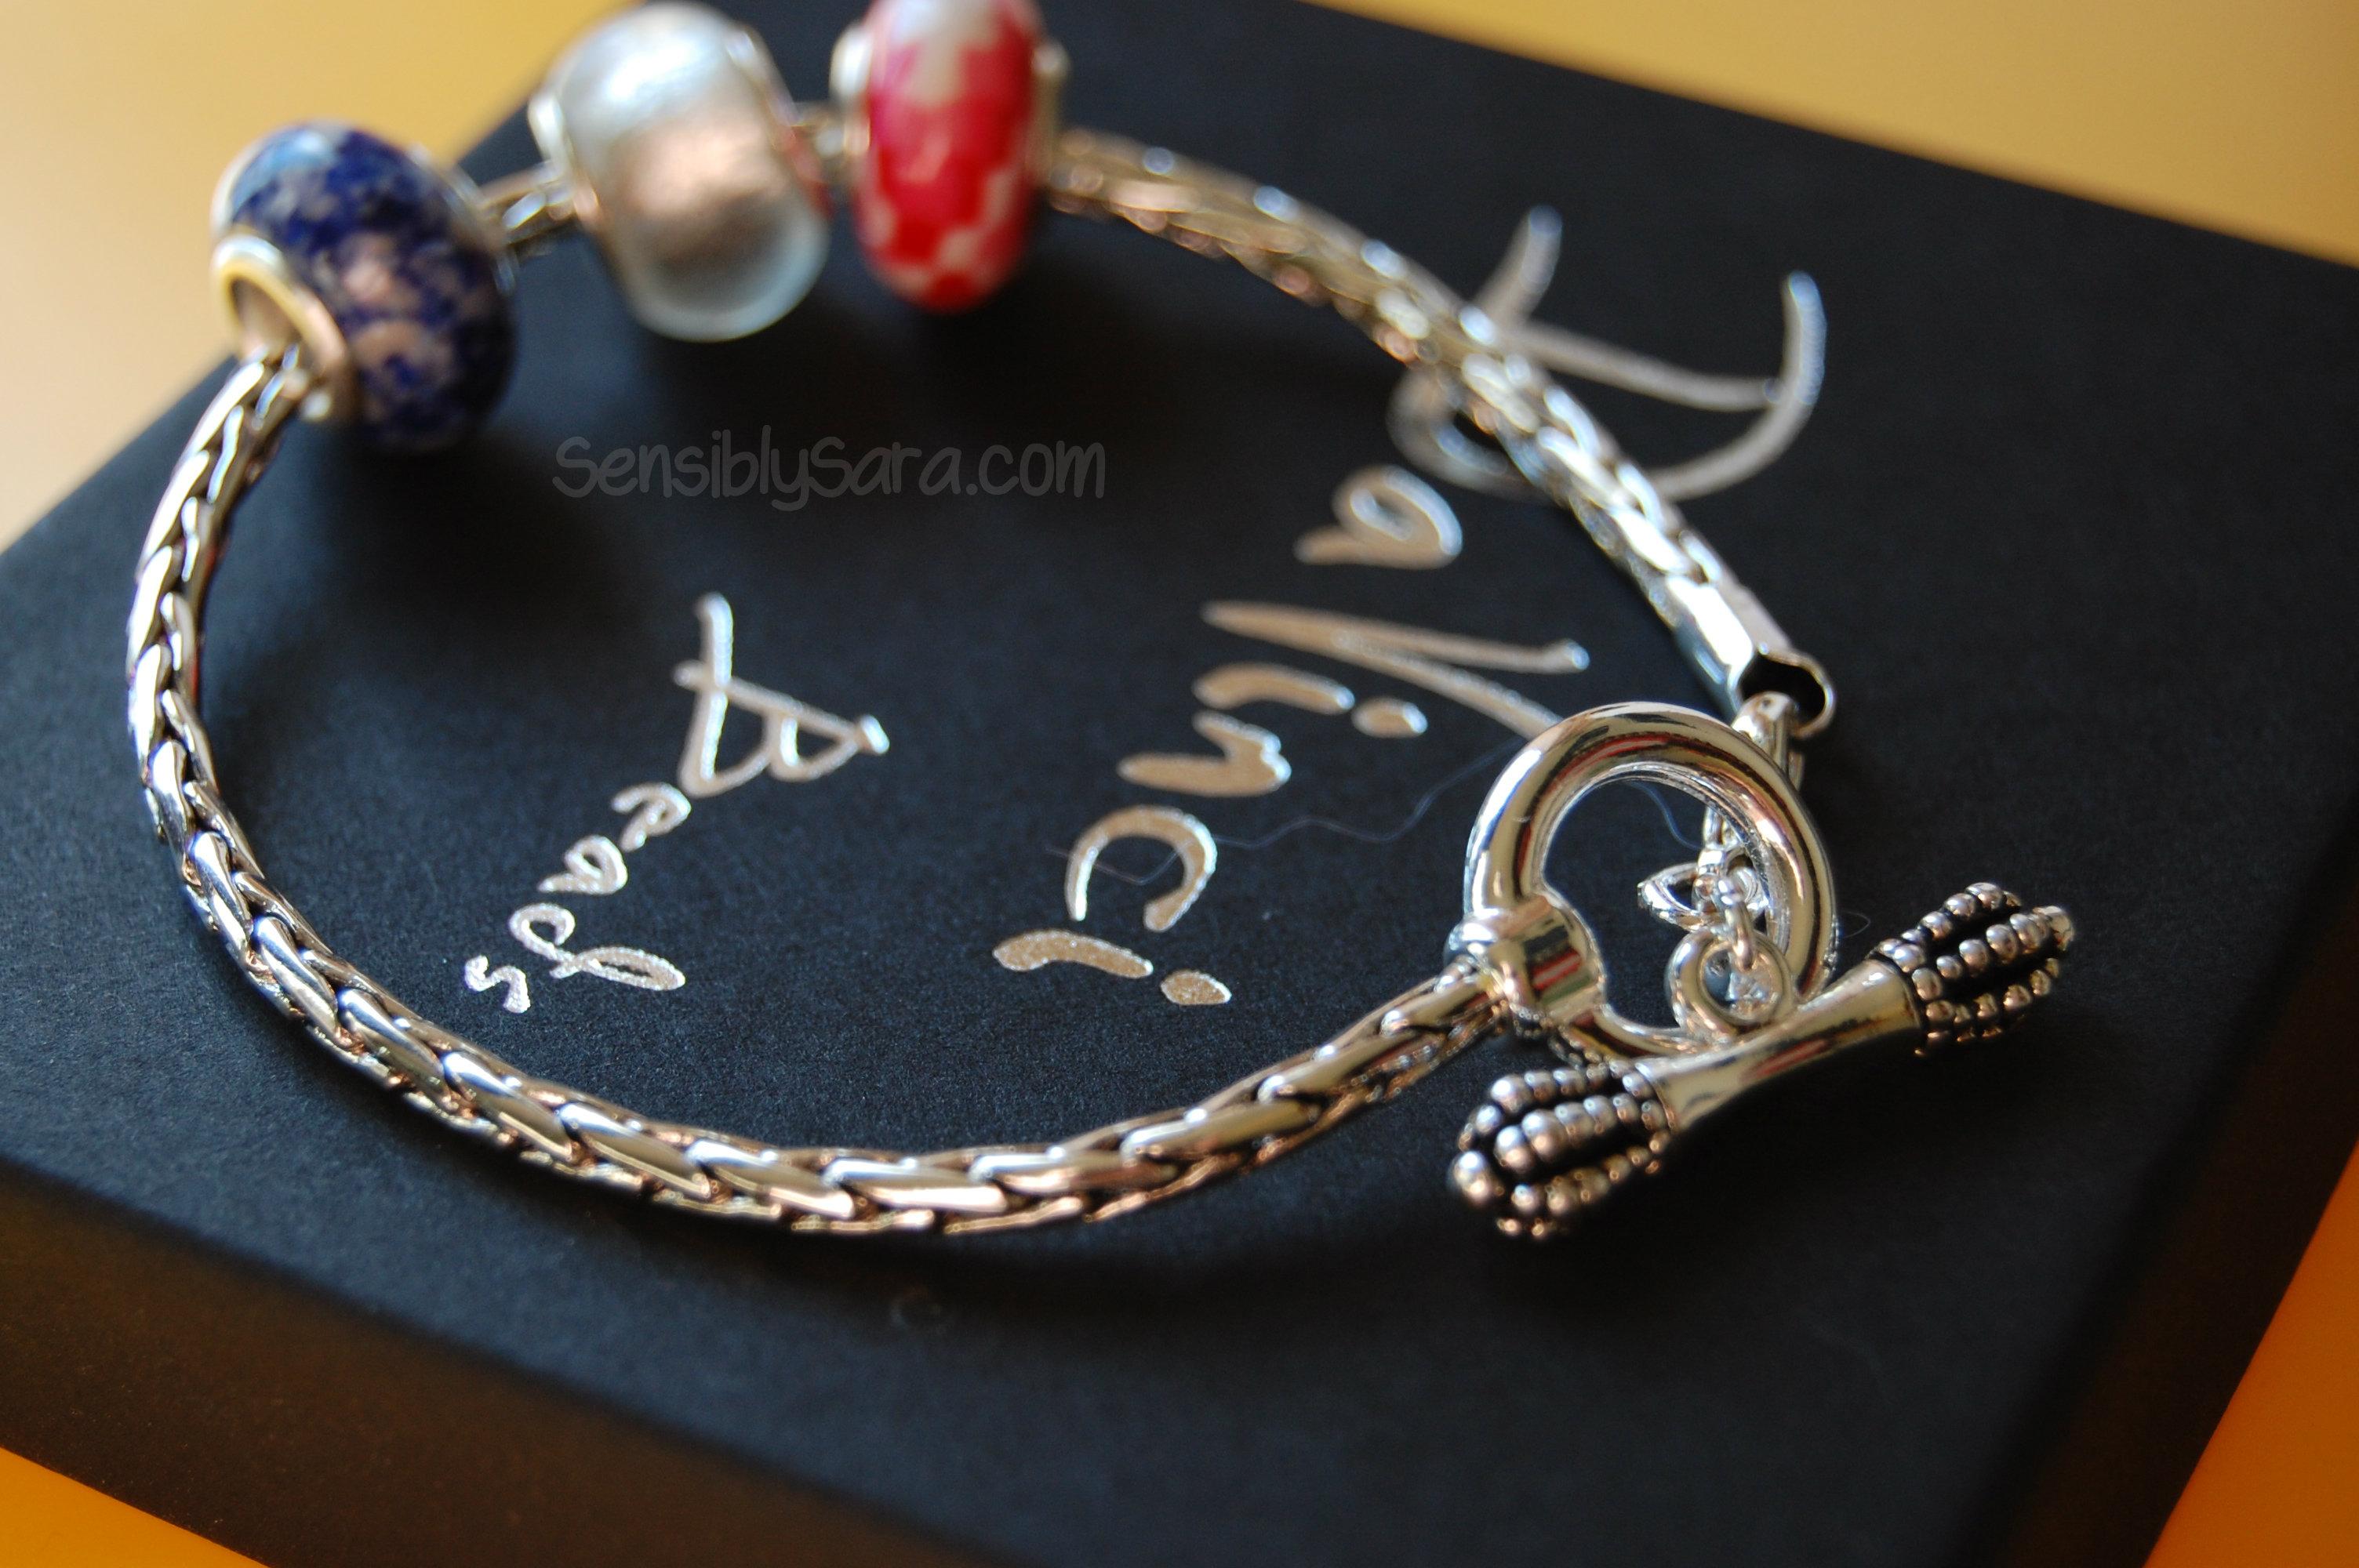 Davinci Beads Bracelet Sensiblysara